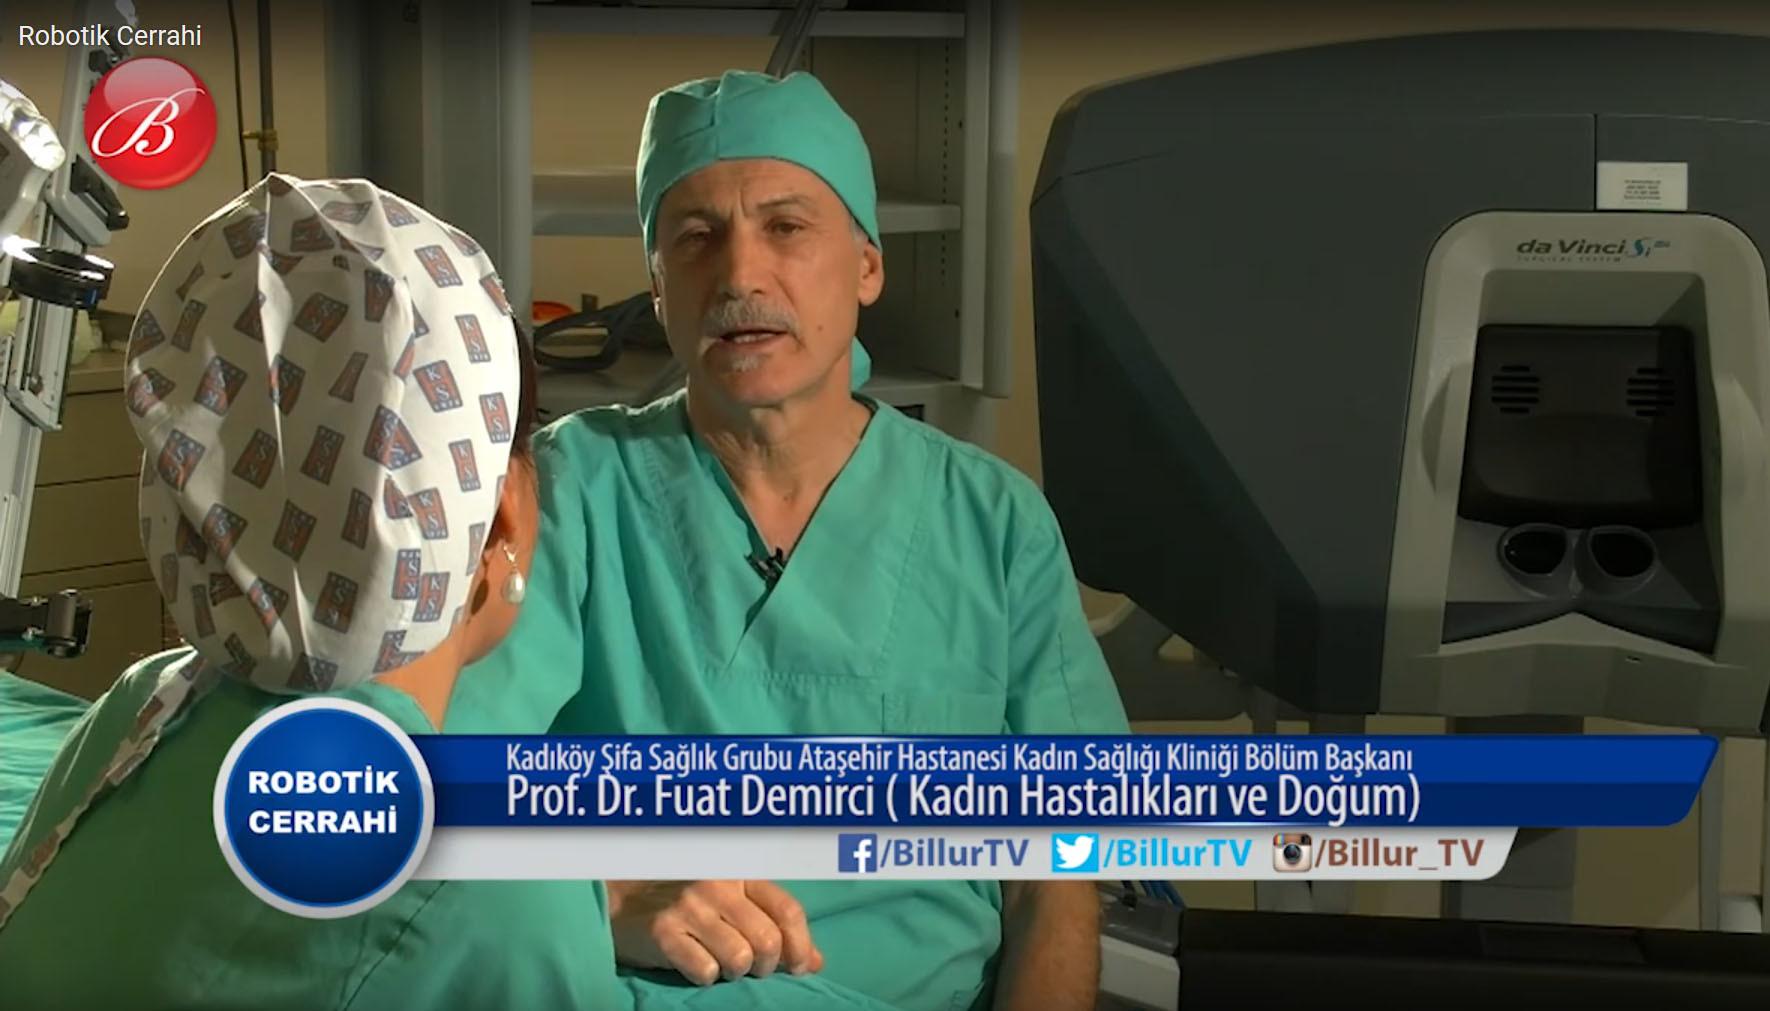 robotik cerrahi tedavisi fuat demirci